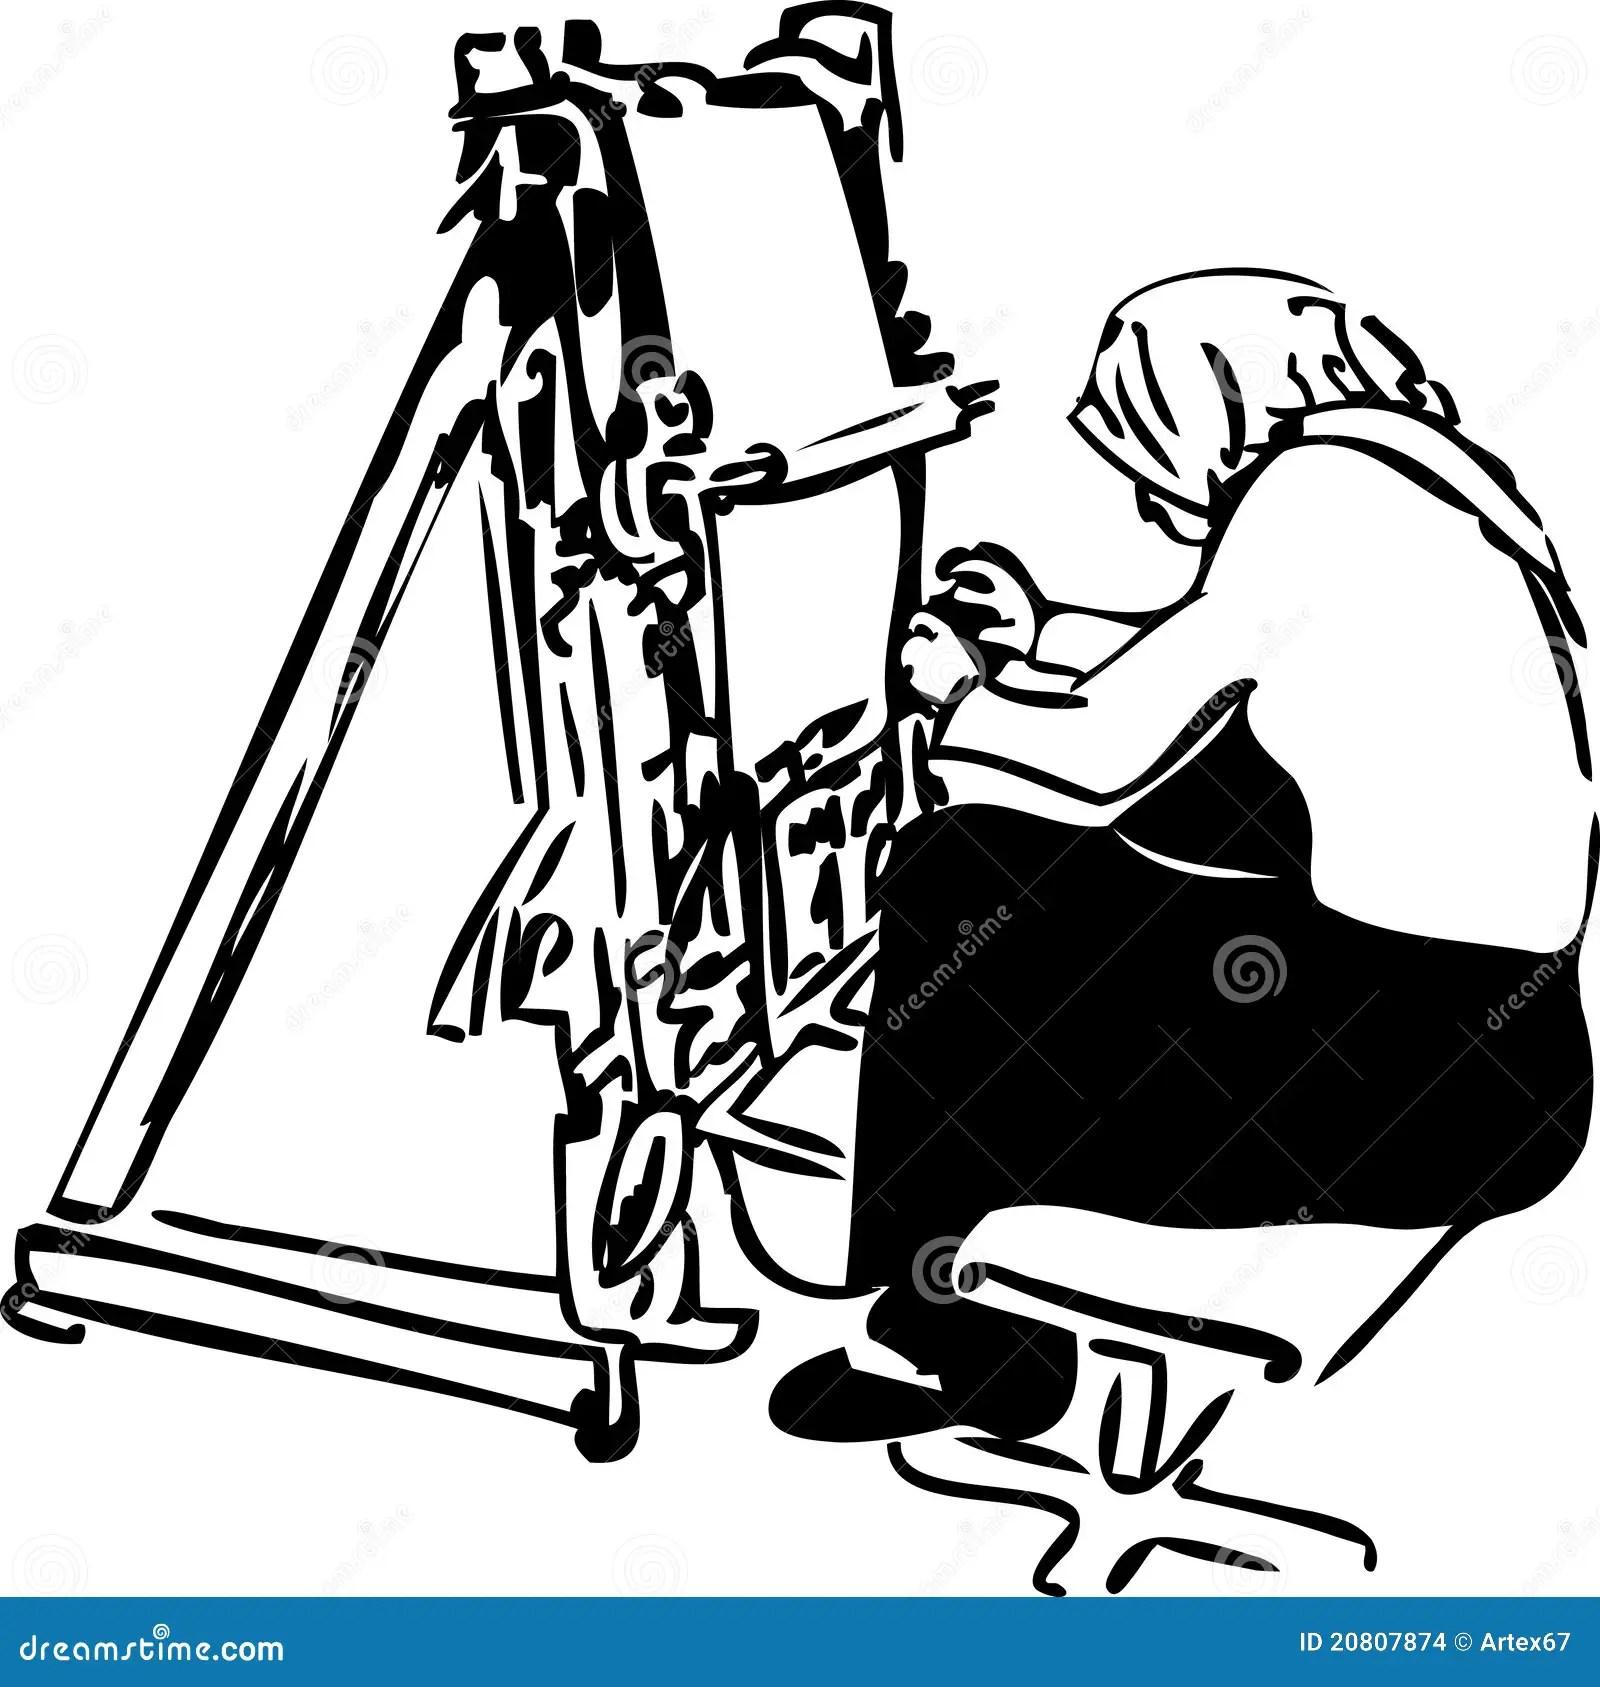 Sketch Of Women Weavers At The Loom Stock Vector